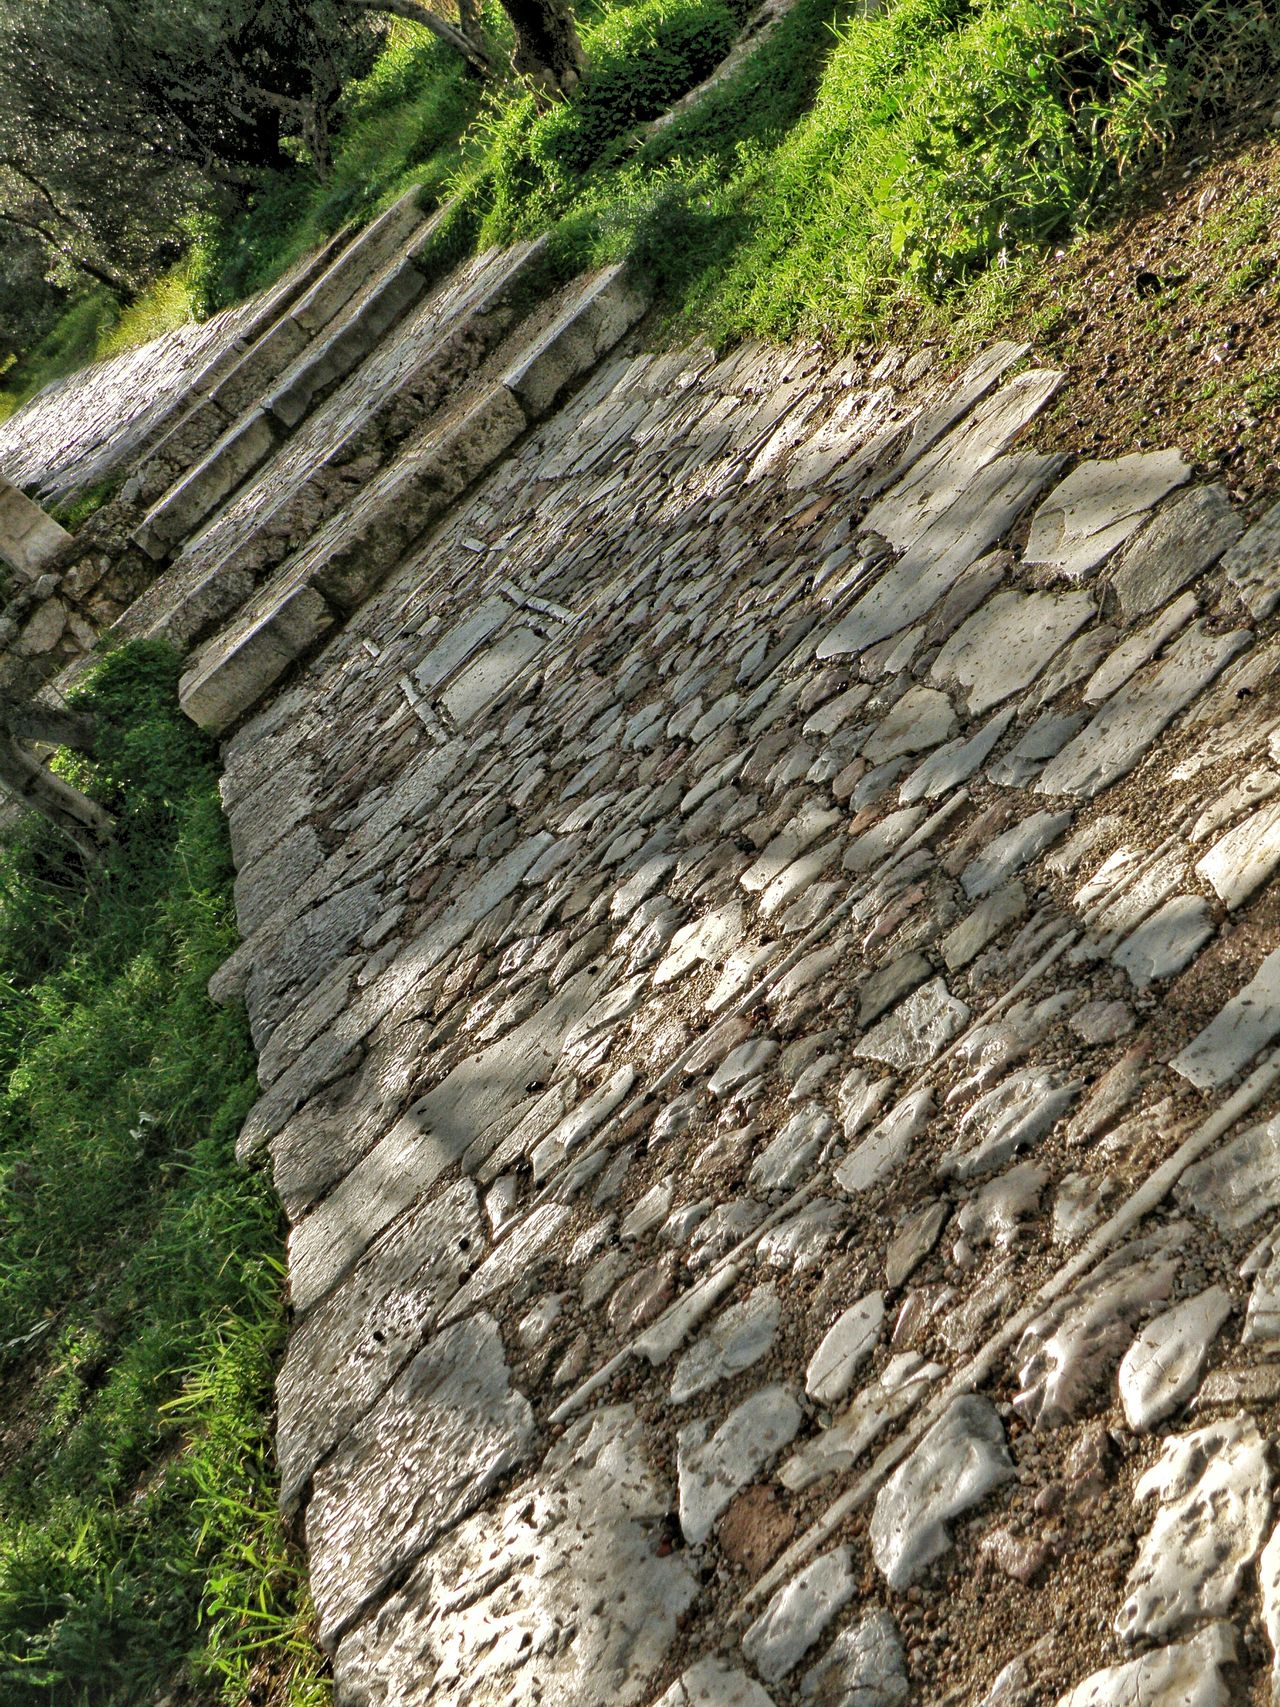 Stone Masonry Stone Pavement Pathway Stone Material Hiking Filopapou Mousson Hill Athens, Greece Athens